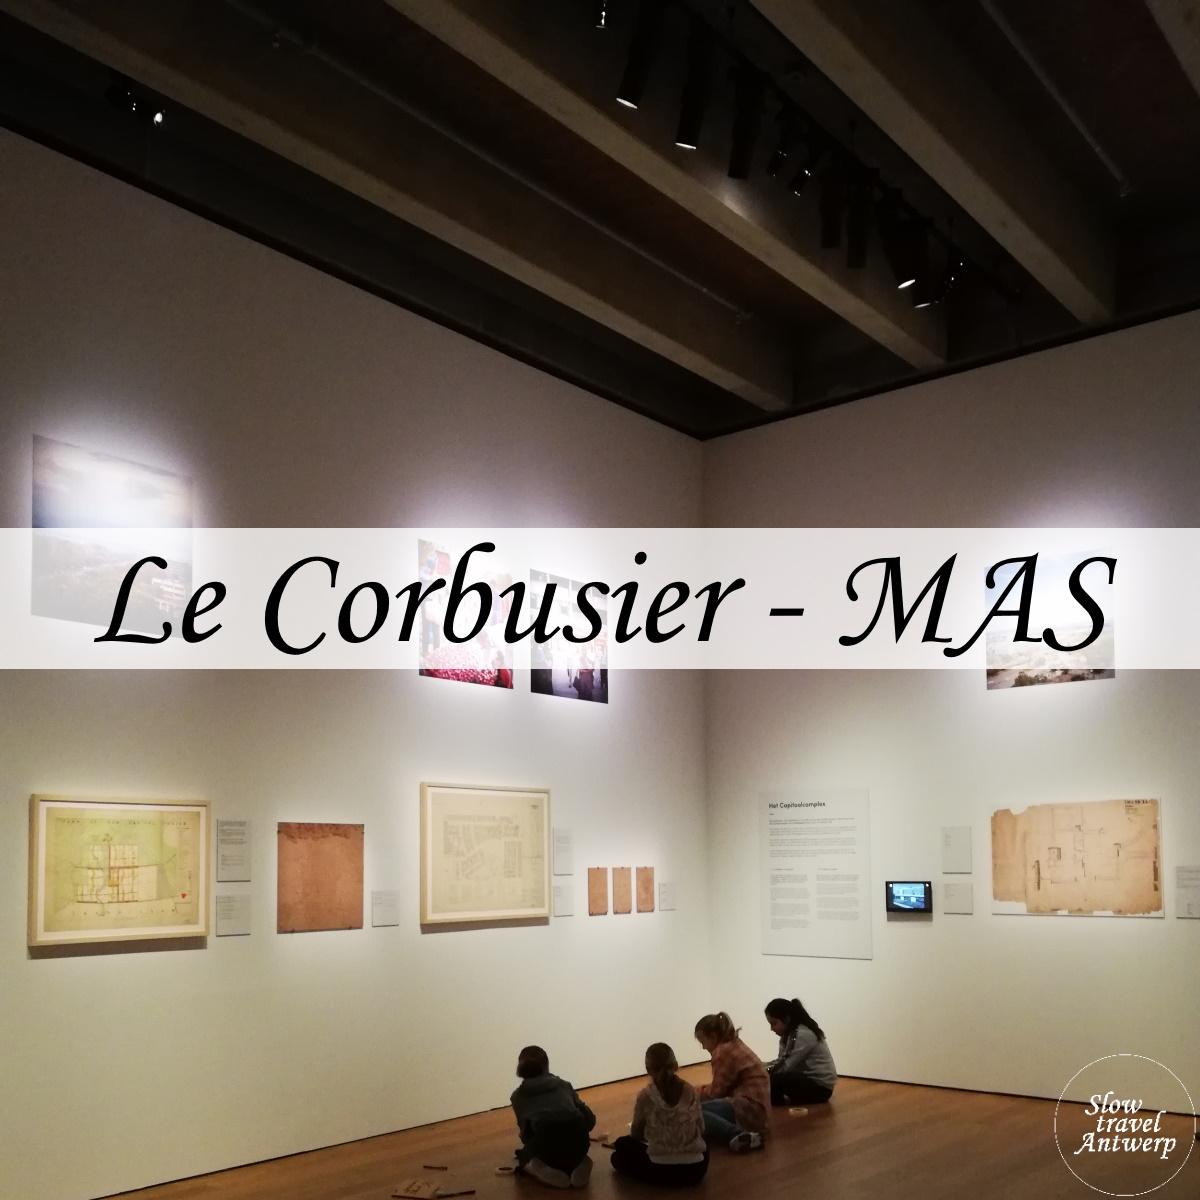 Le Corbusier in MAS - titel